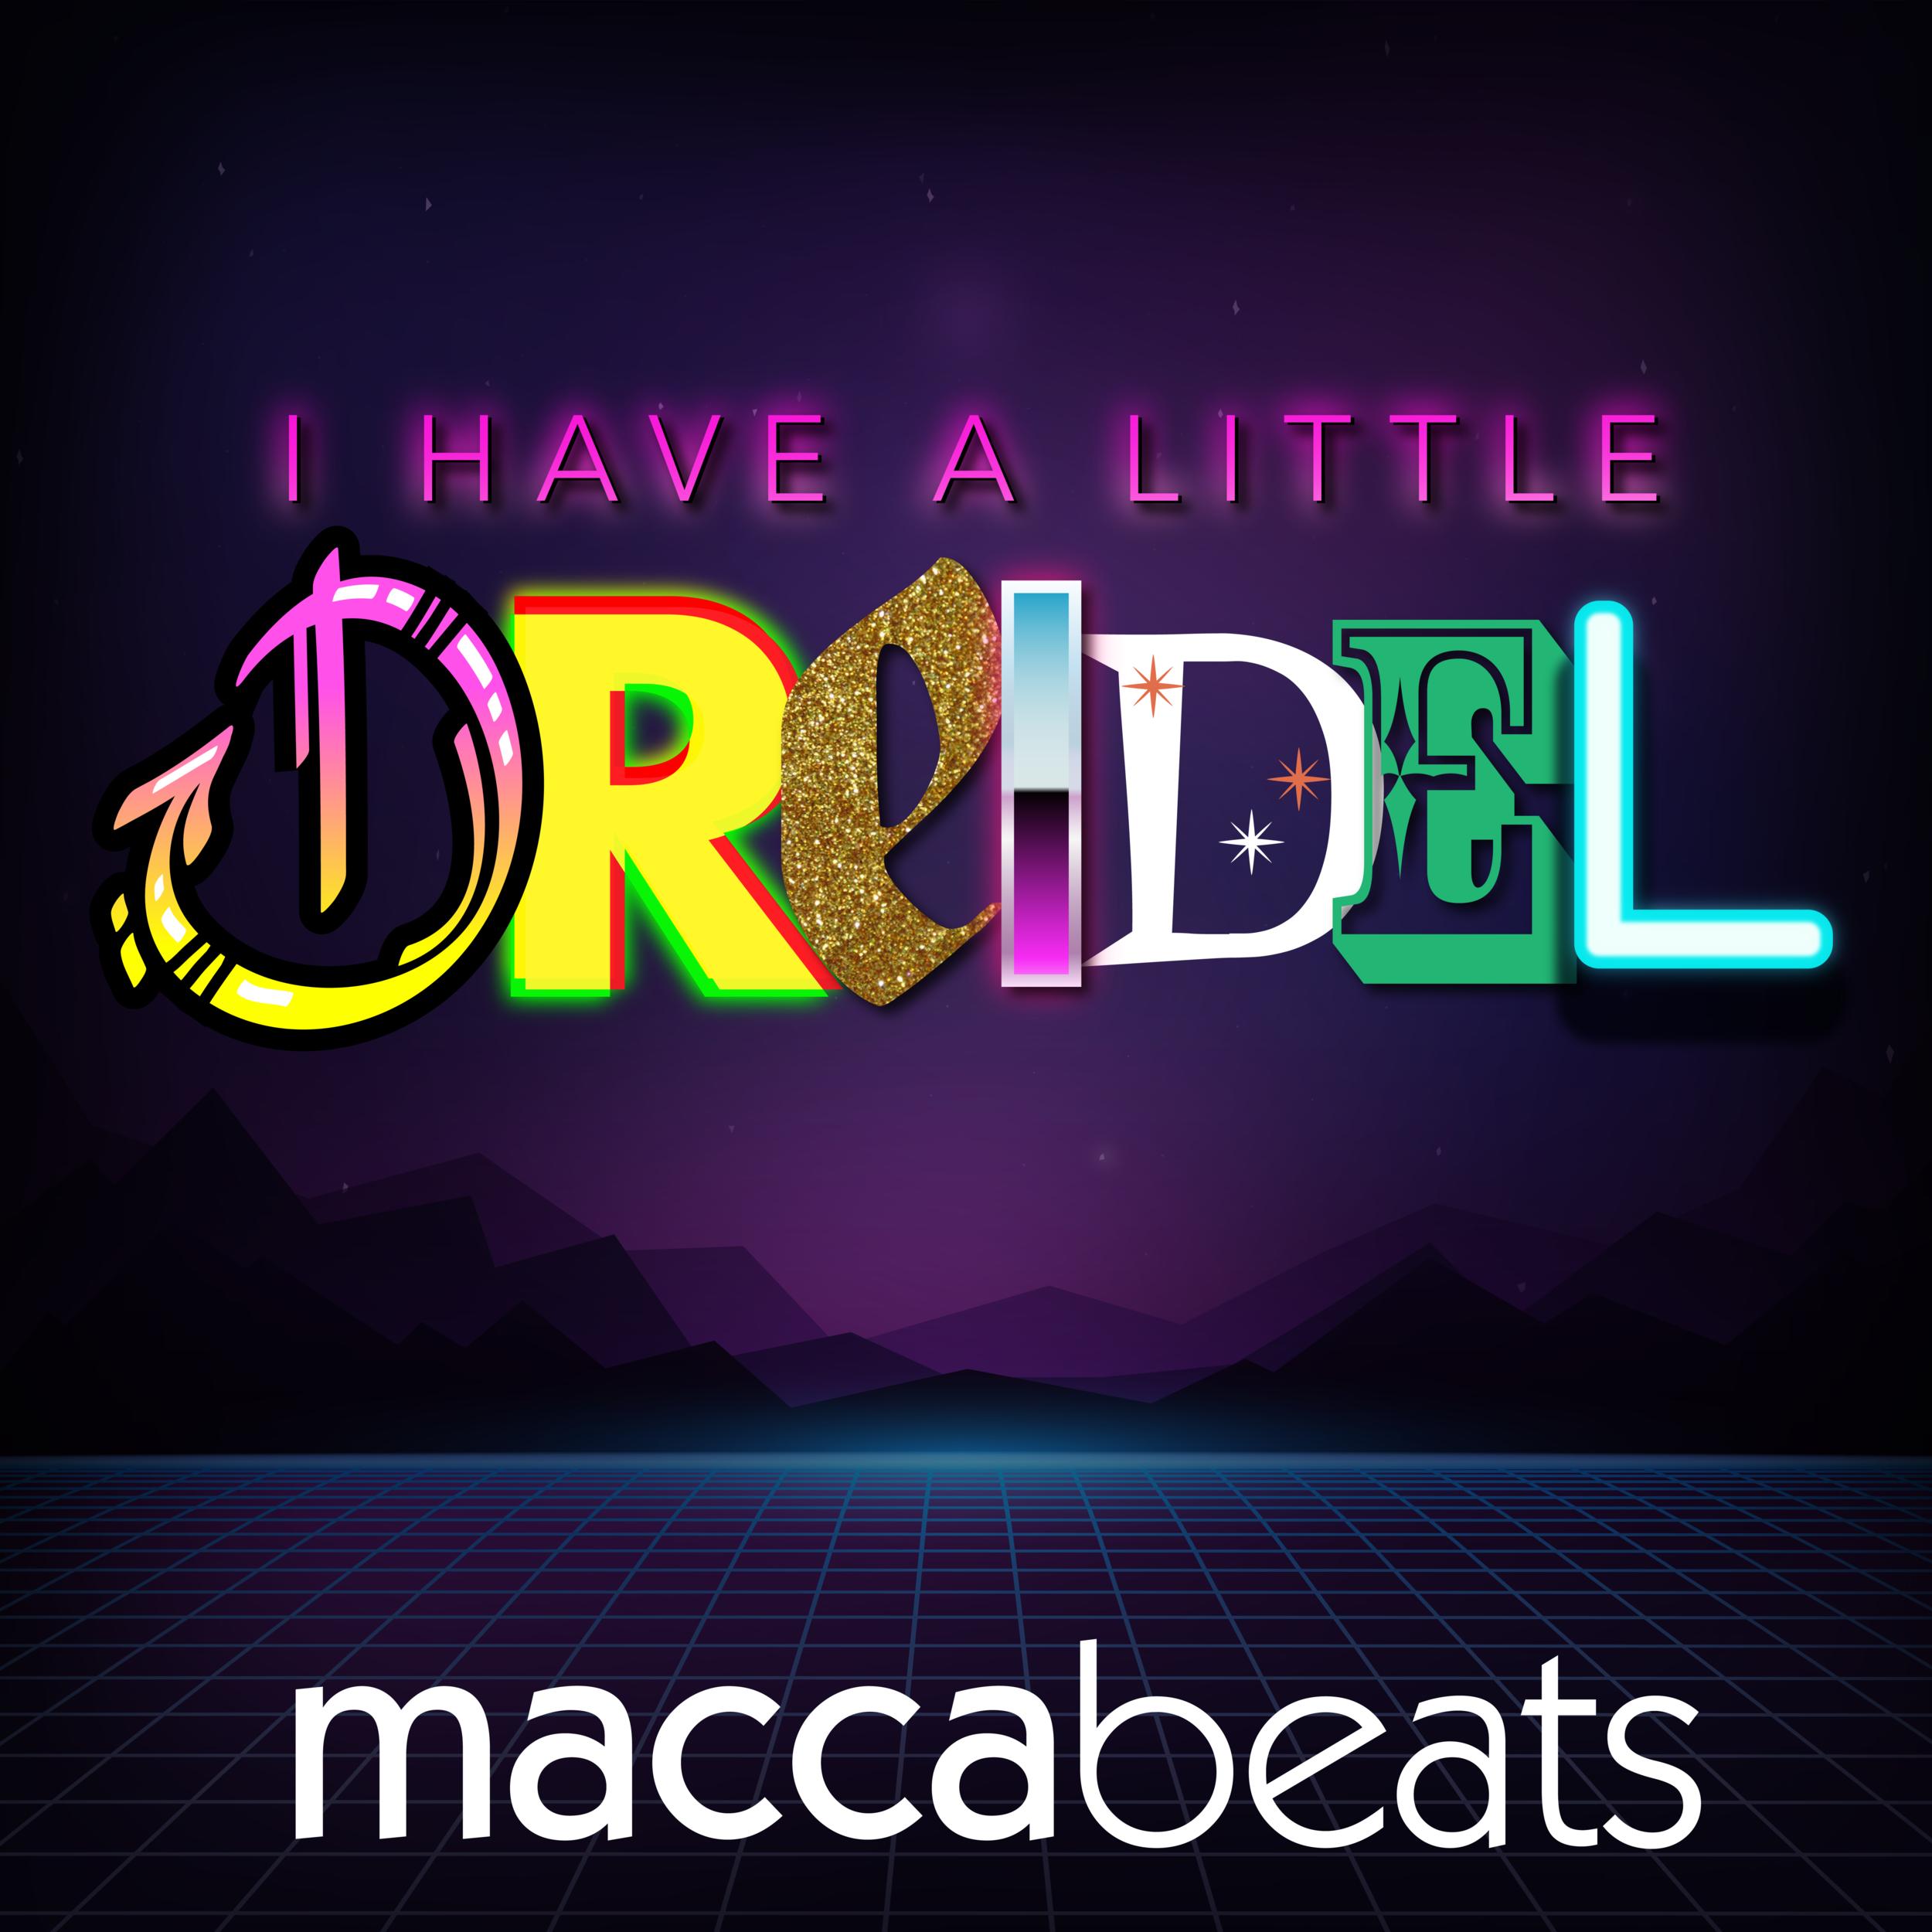 I Have A Little Dreidel - Album Artwork, Maccabeats